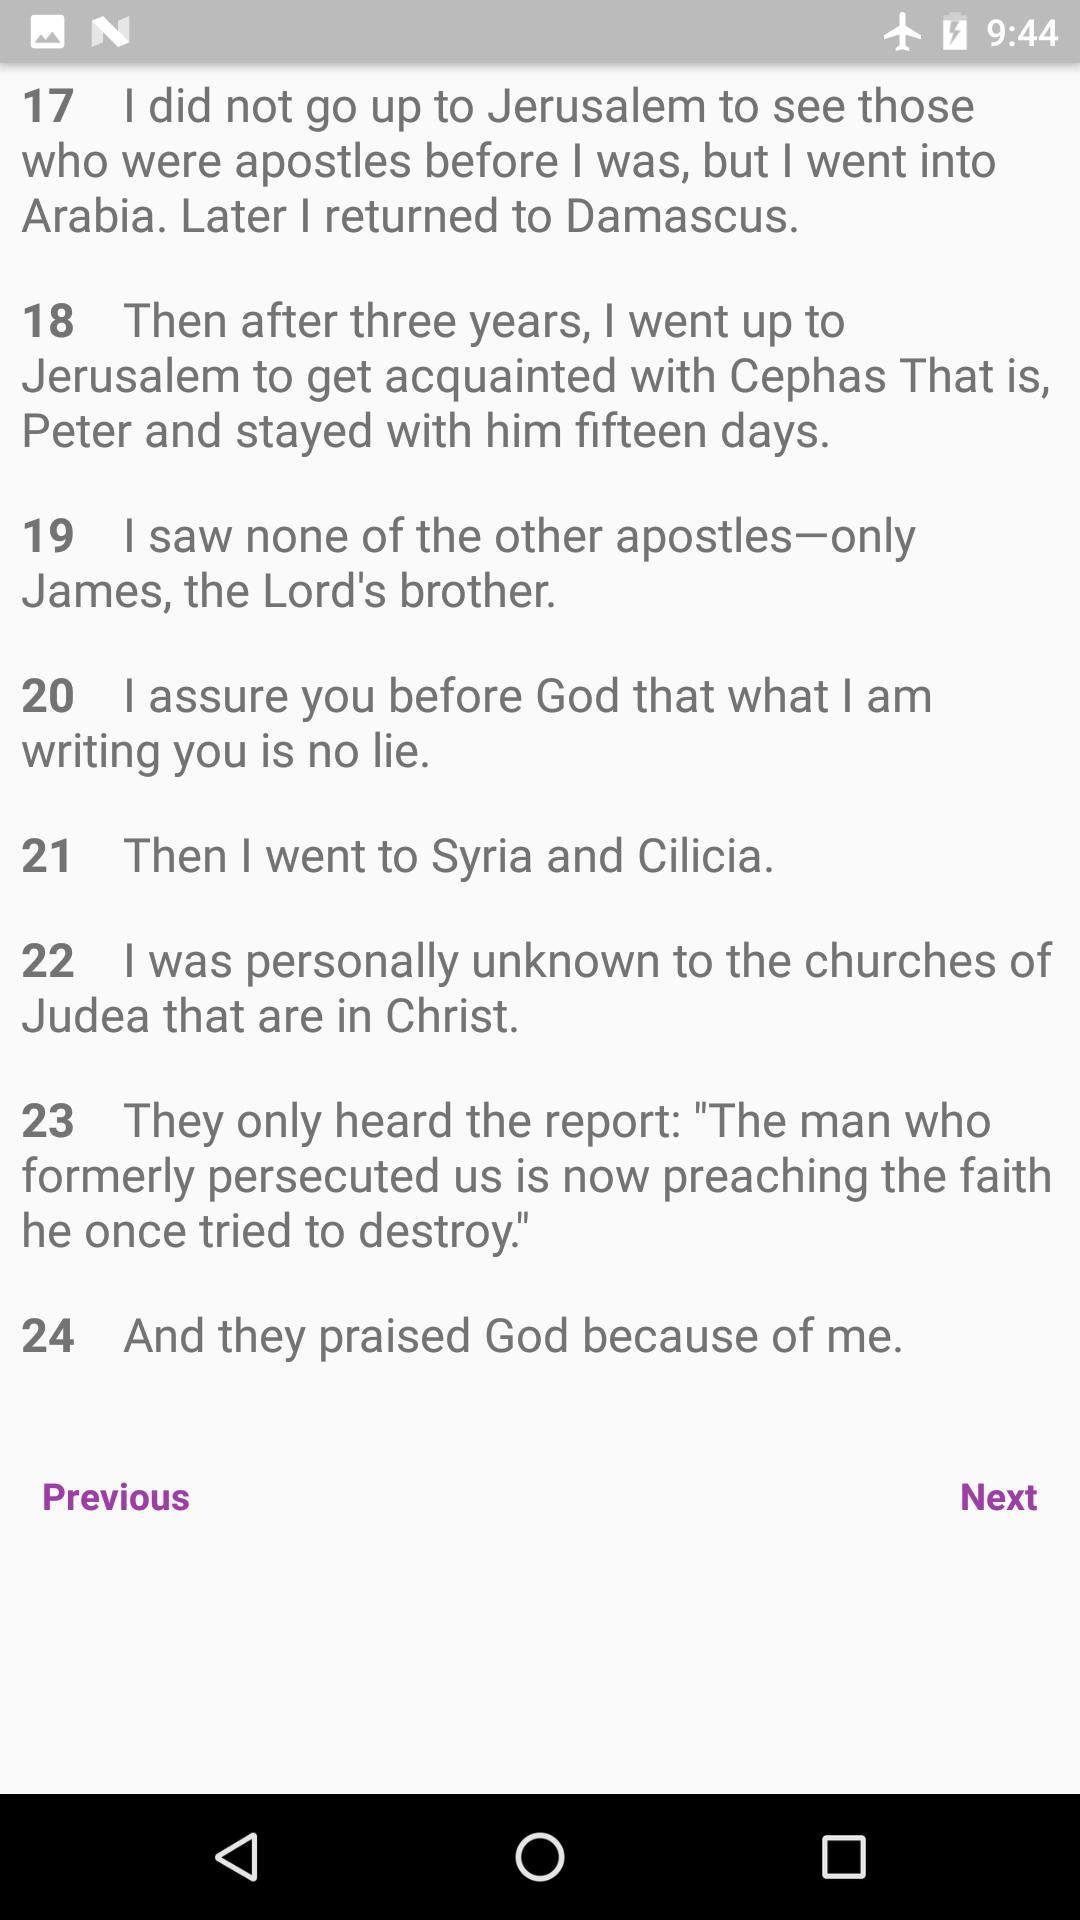 NIV Bible (Offline) for Android - APK Download